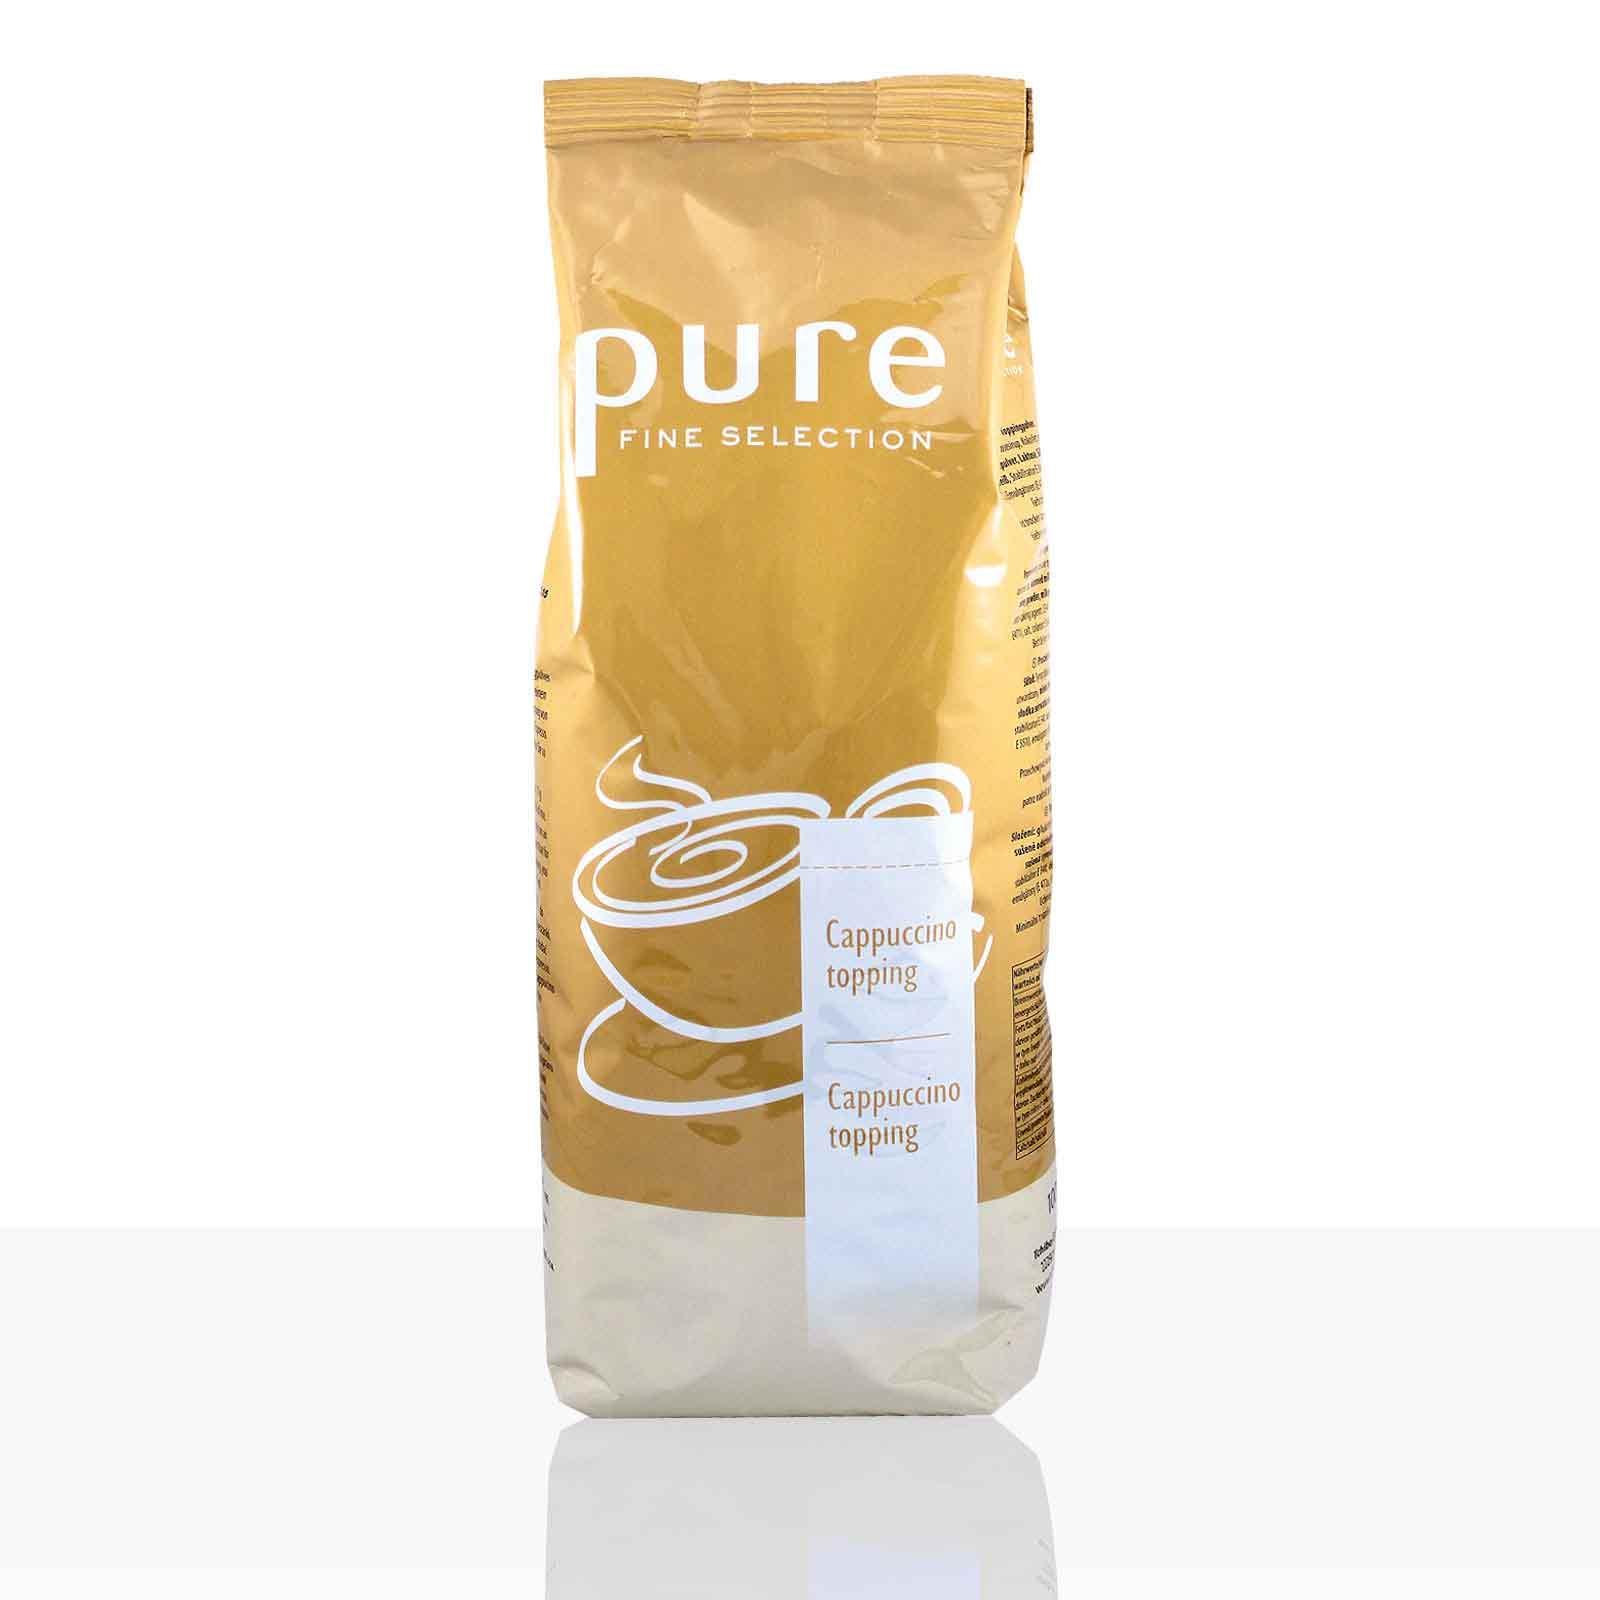 Tchibo Pure Fine Selection Cappuccino Topping Crema 10 x 1kg Milchpulver